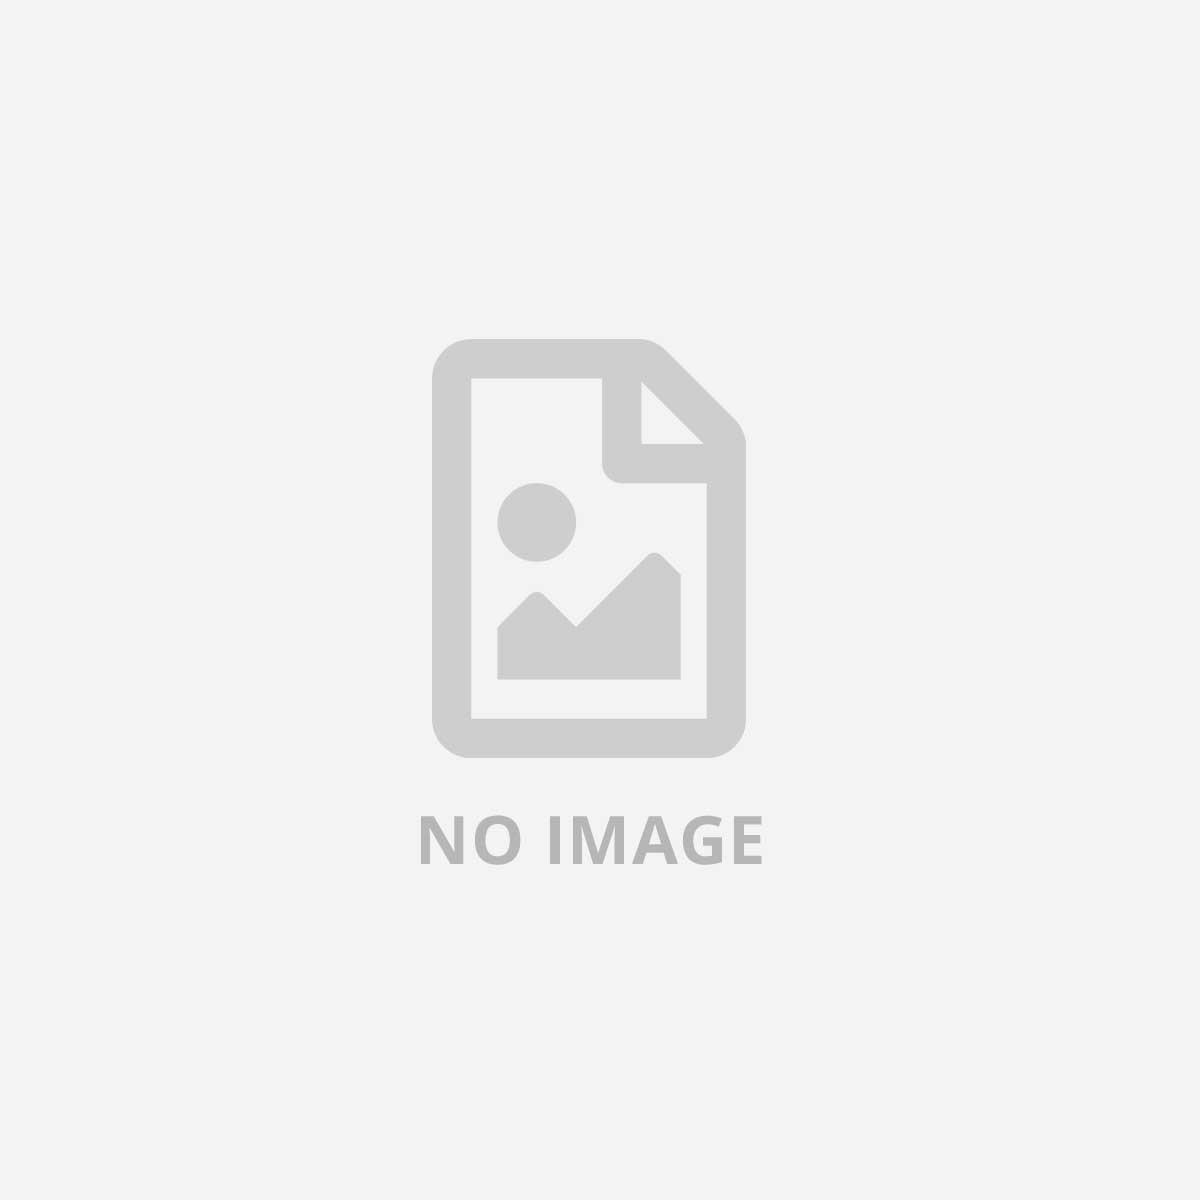 HAMLET NEW VOLTAIRE 12/220V - 150W + USB